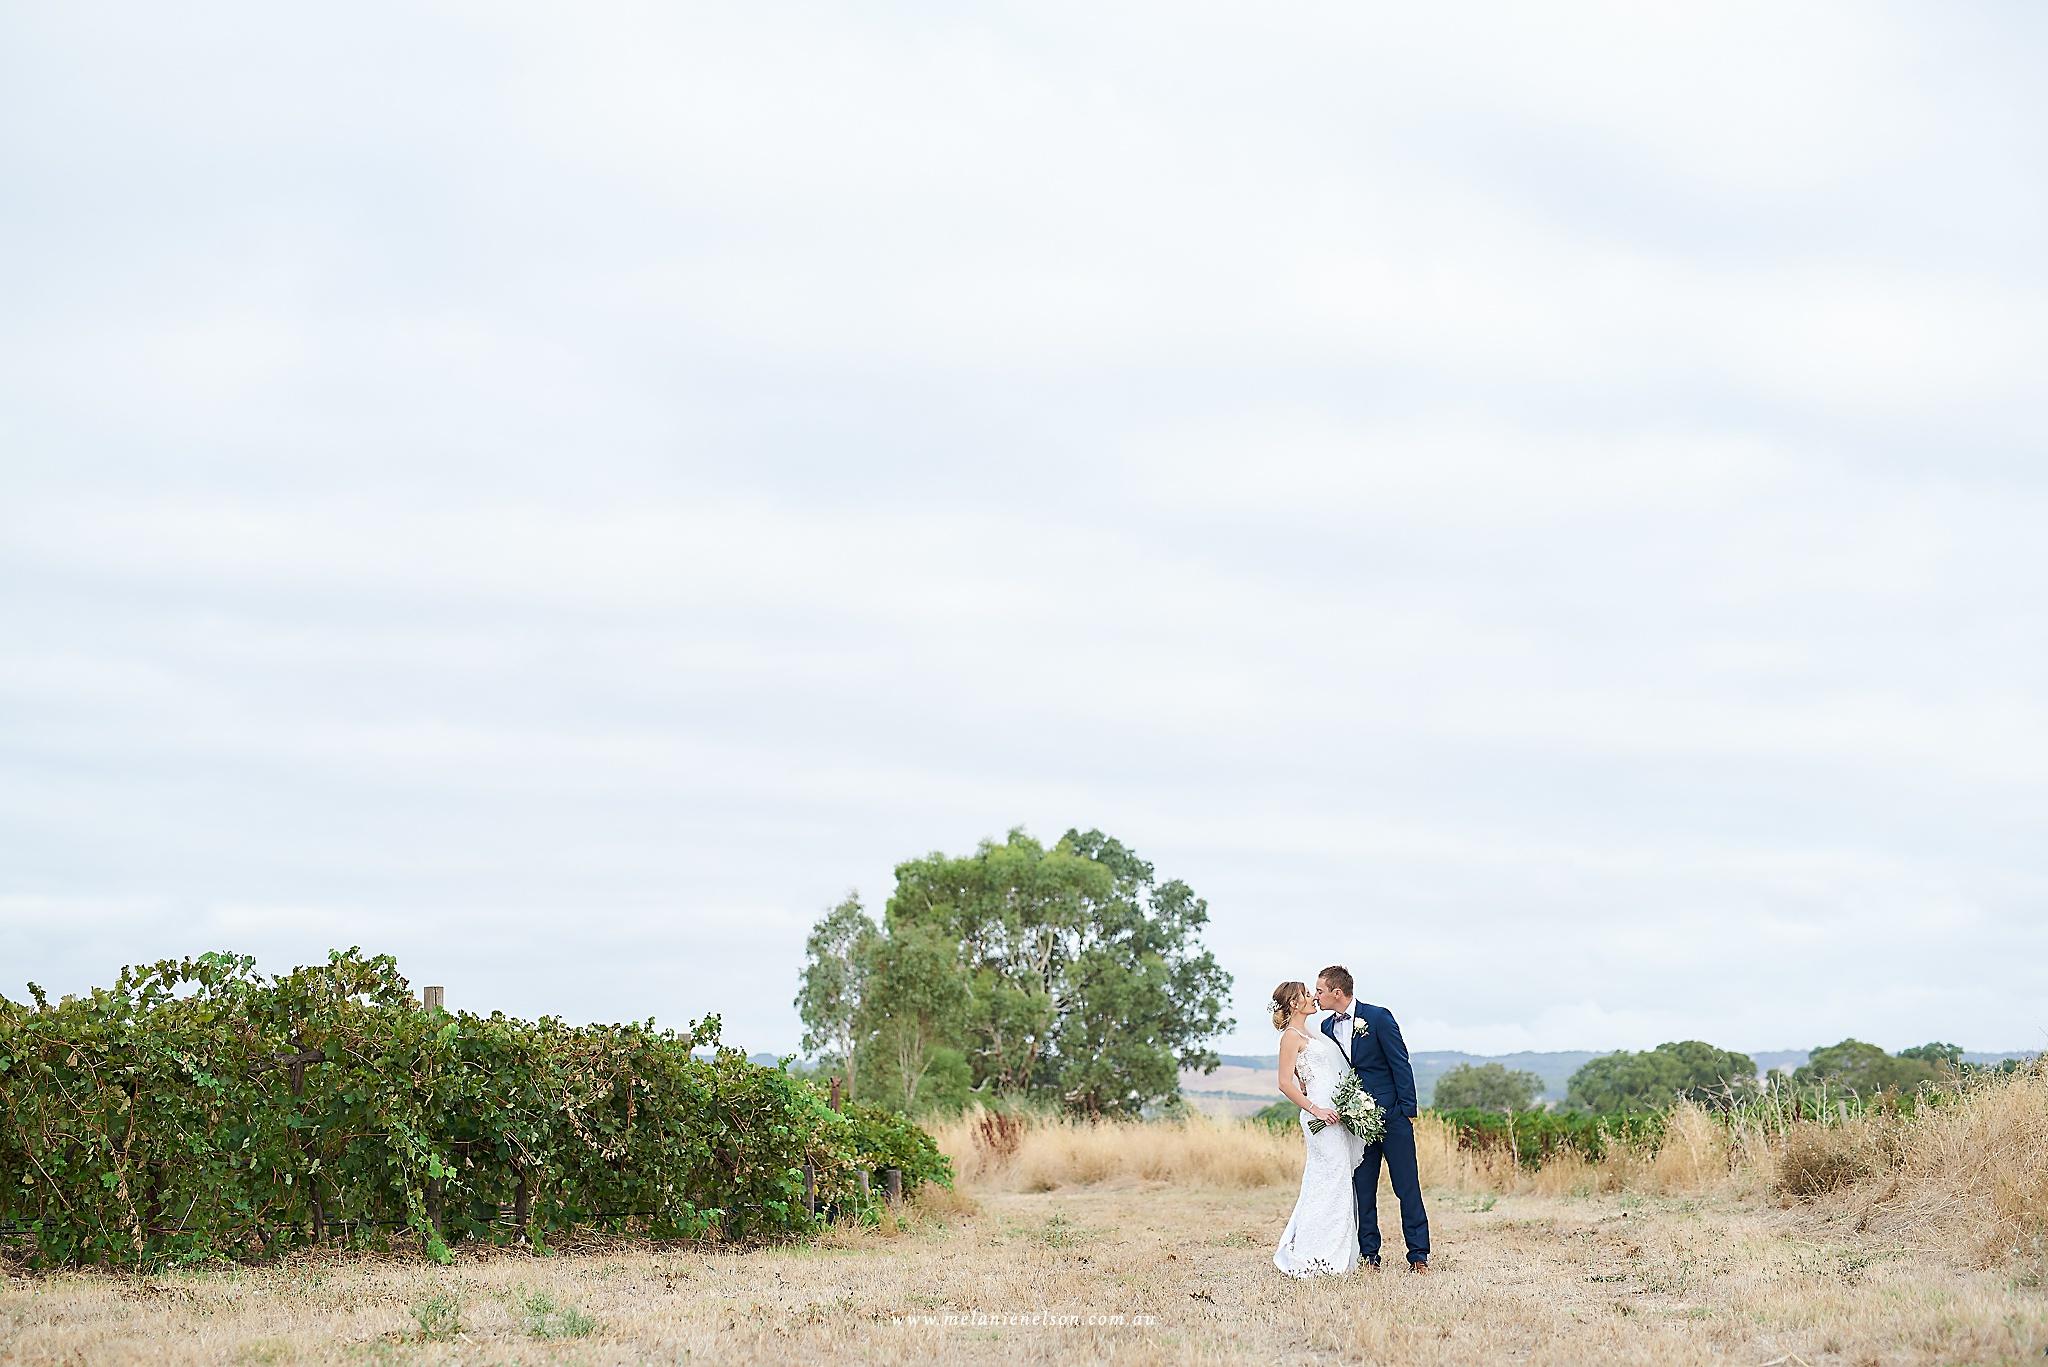 serafino_wedding_photography_0061.jpg